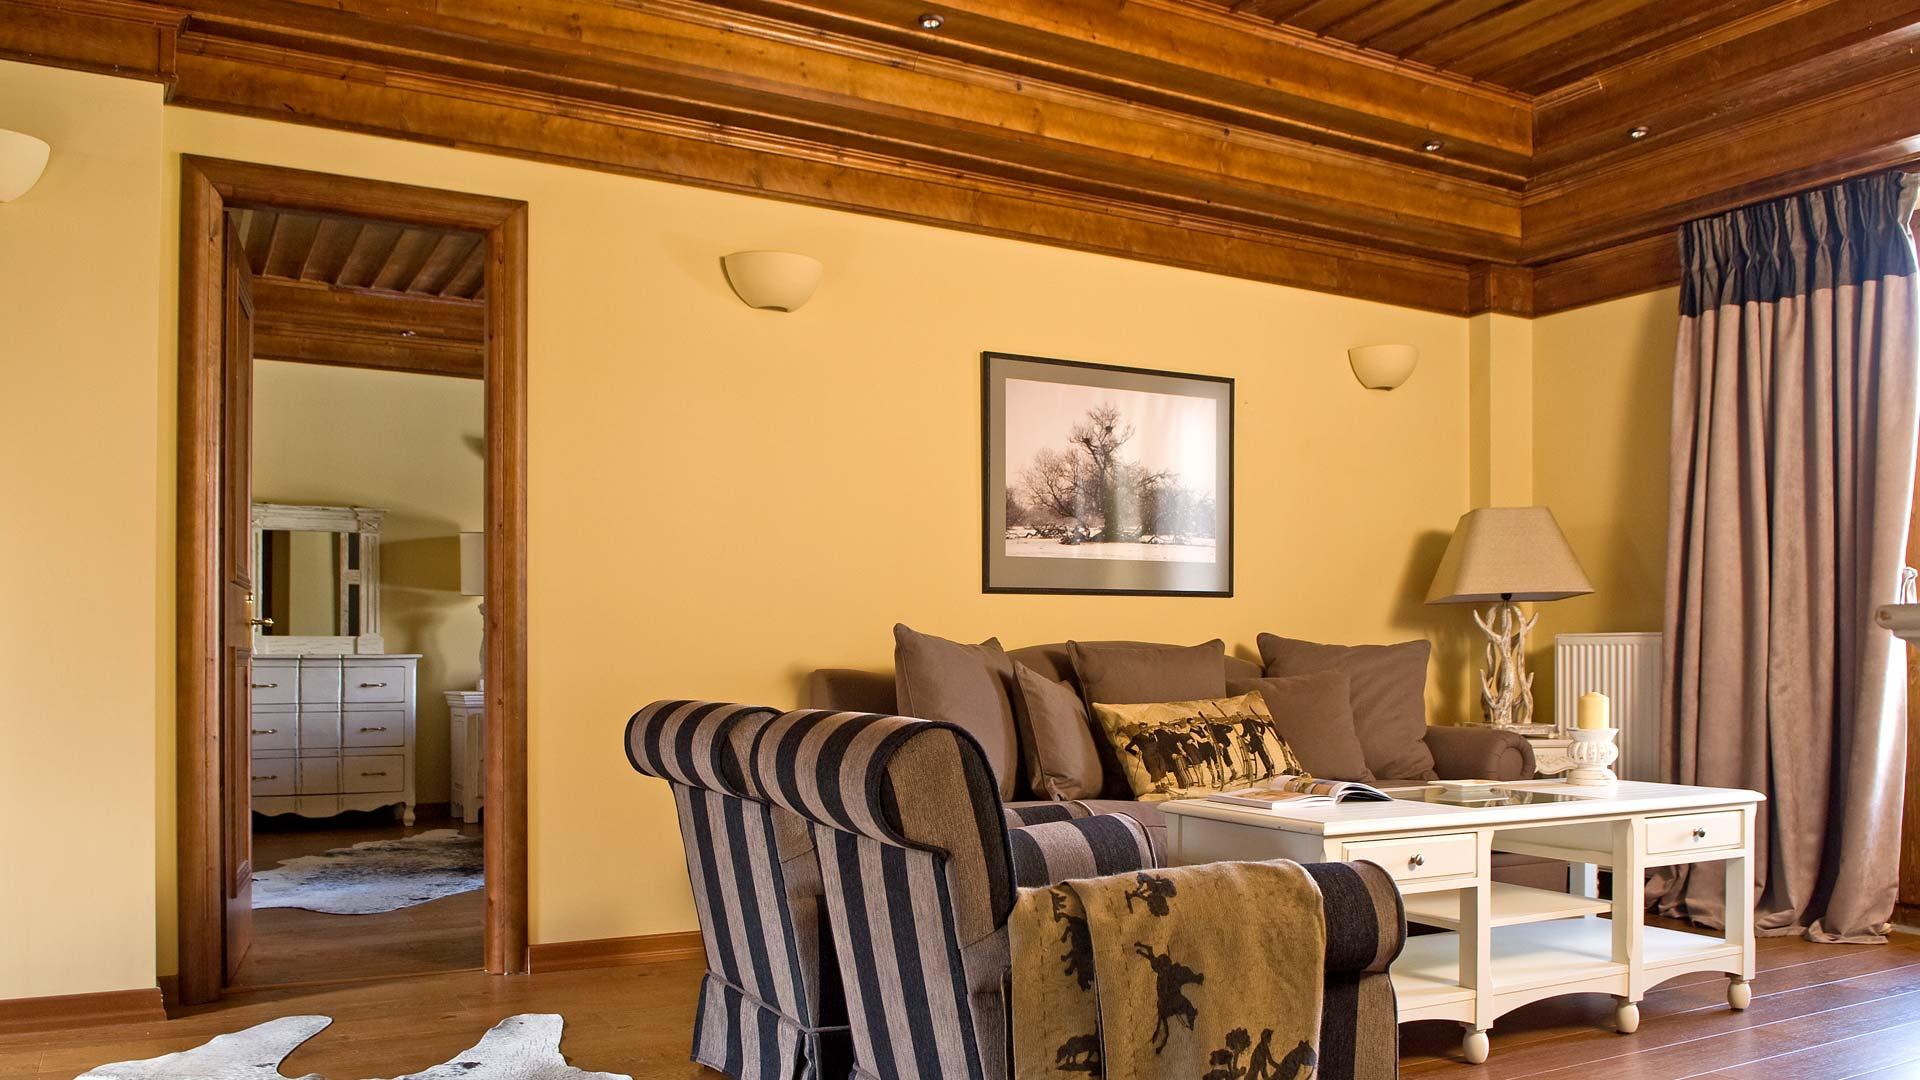 Grand Suites, Honeymoon, Ξενοδοχείο Αρχοντικό Χατζηγάκη, Περτούλι, Ελάτη